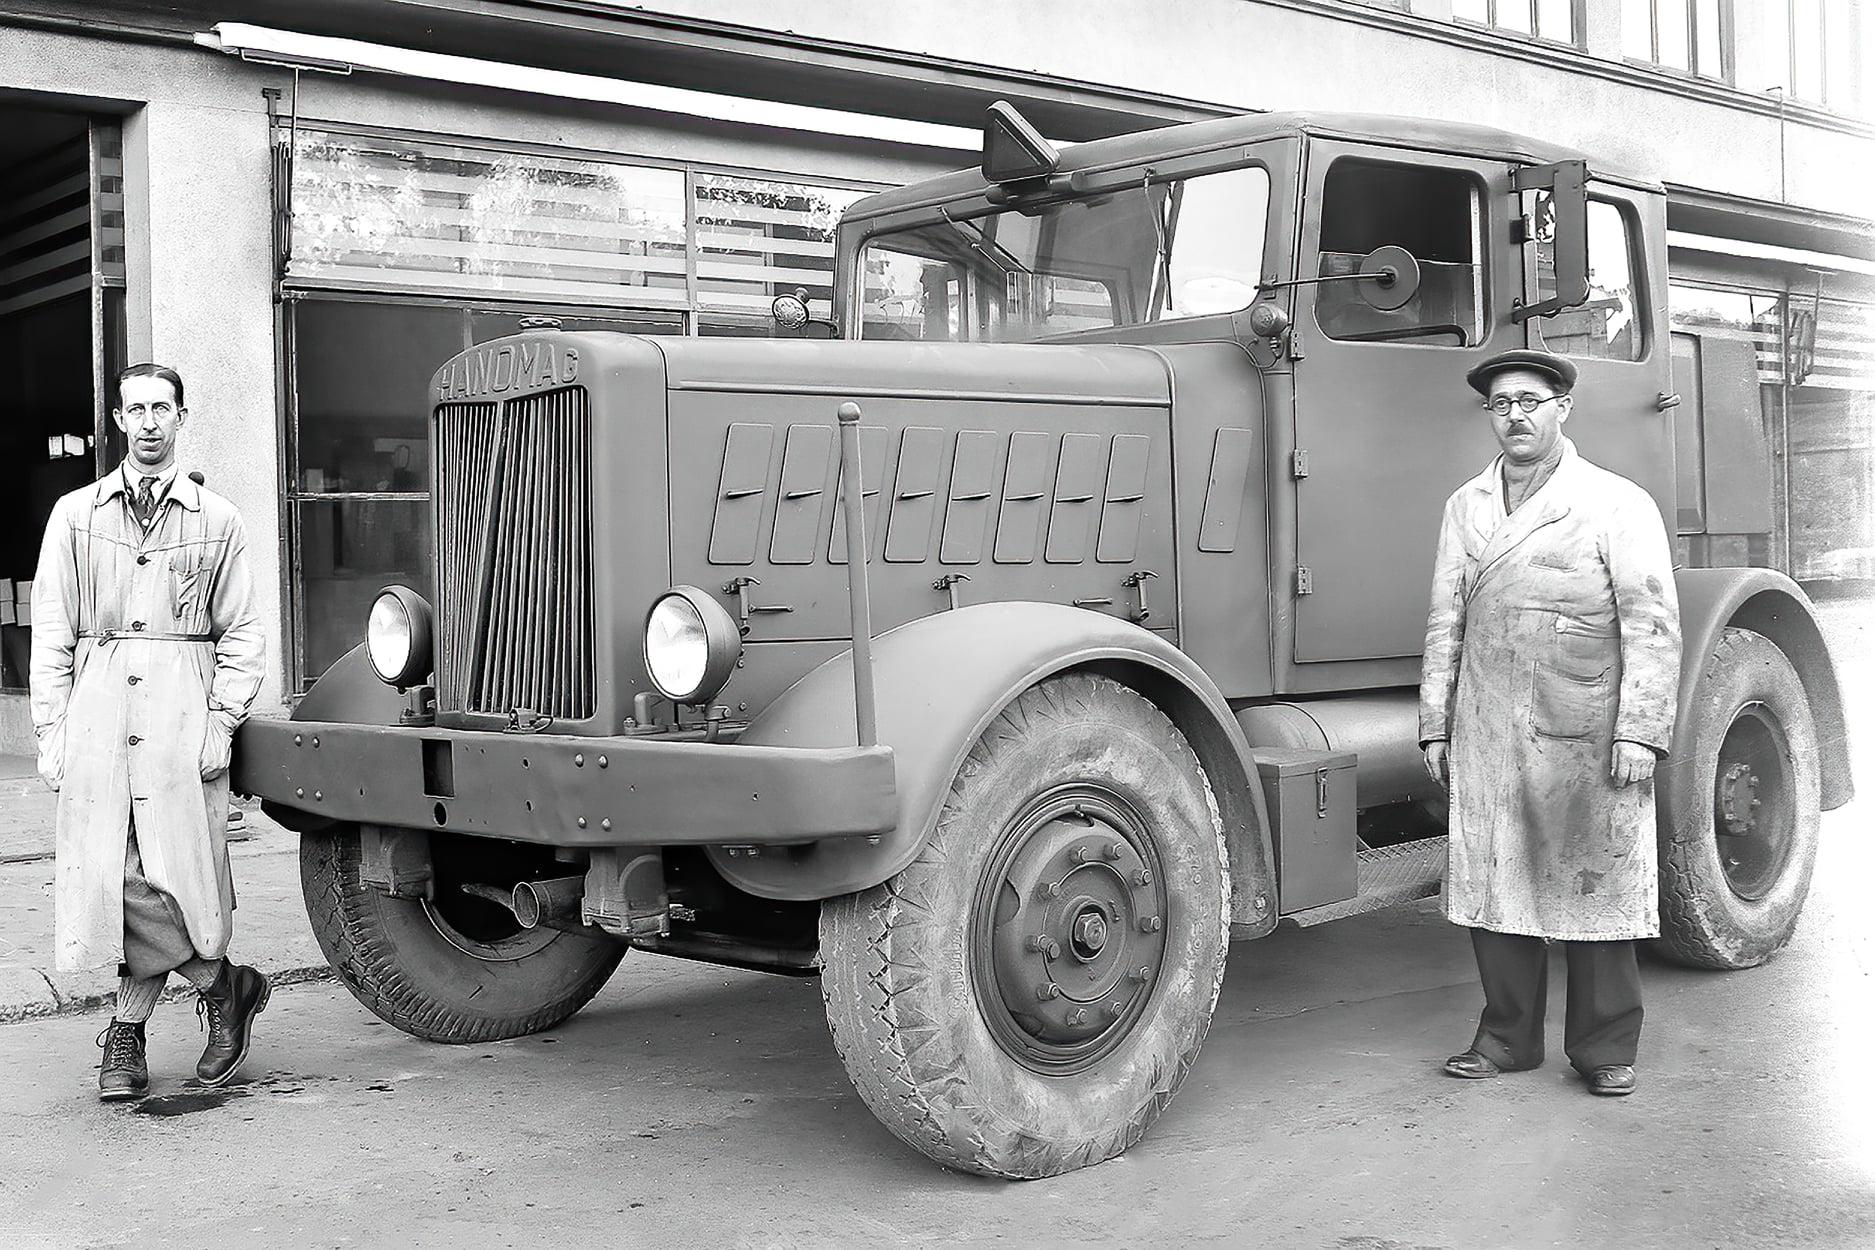 Hanomag-6-6-T-1945-Bergans-Auto--Slottsfjellsmuseet